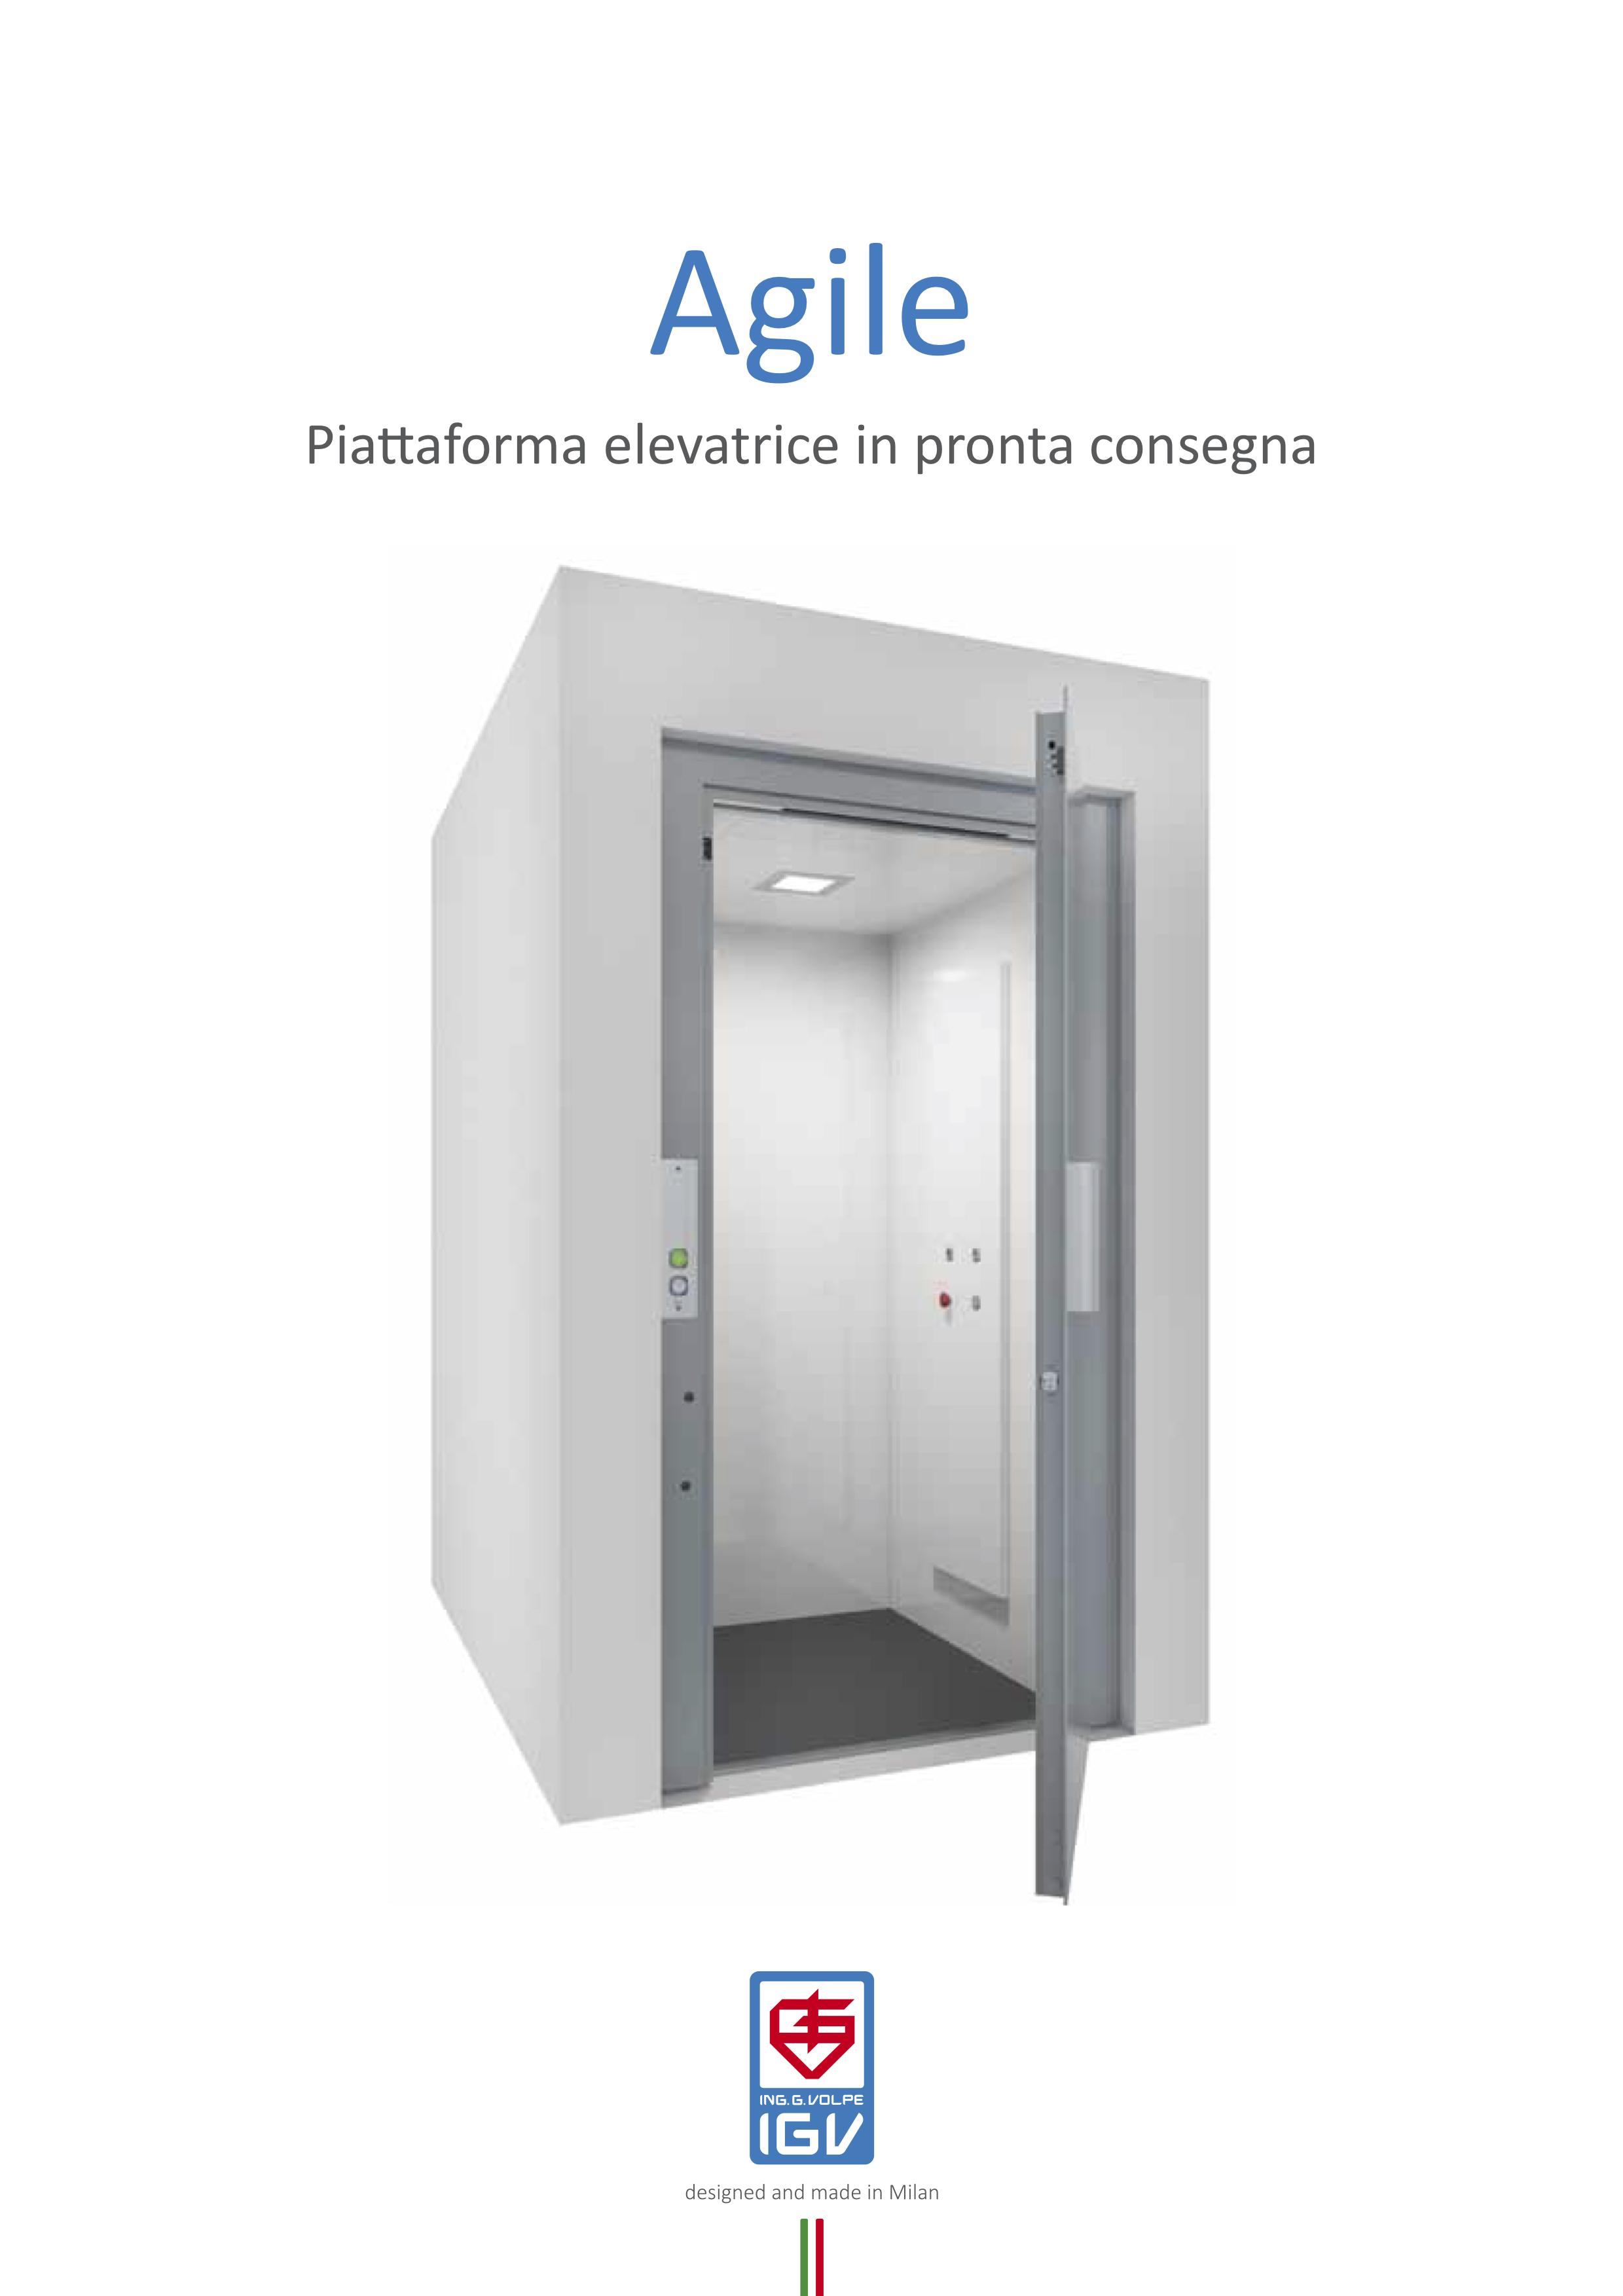 IGV-Agile-ITA